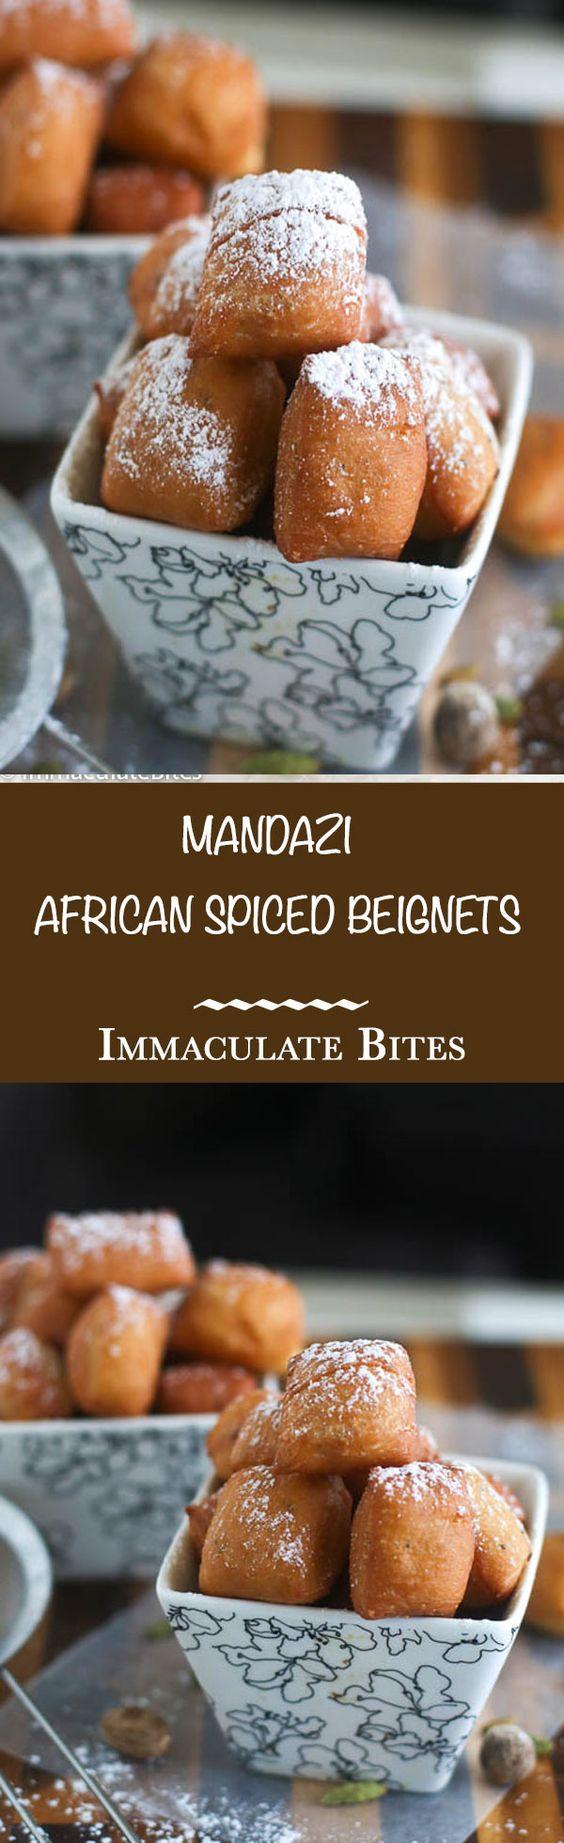 how to make ugandan mandazi